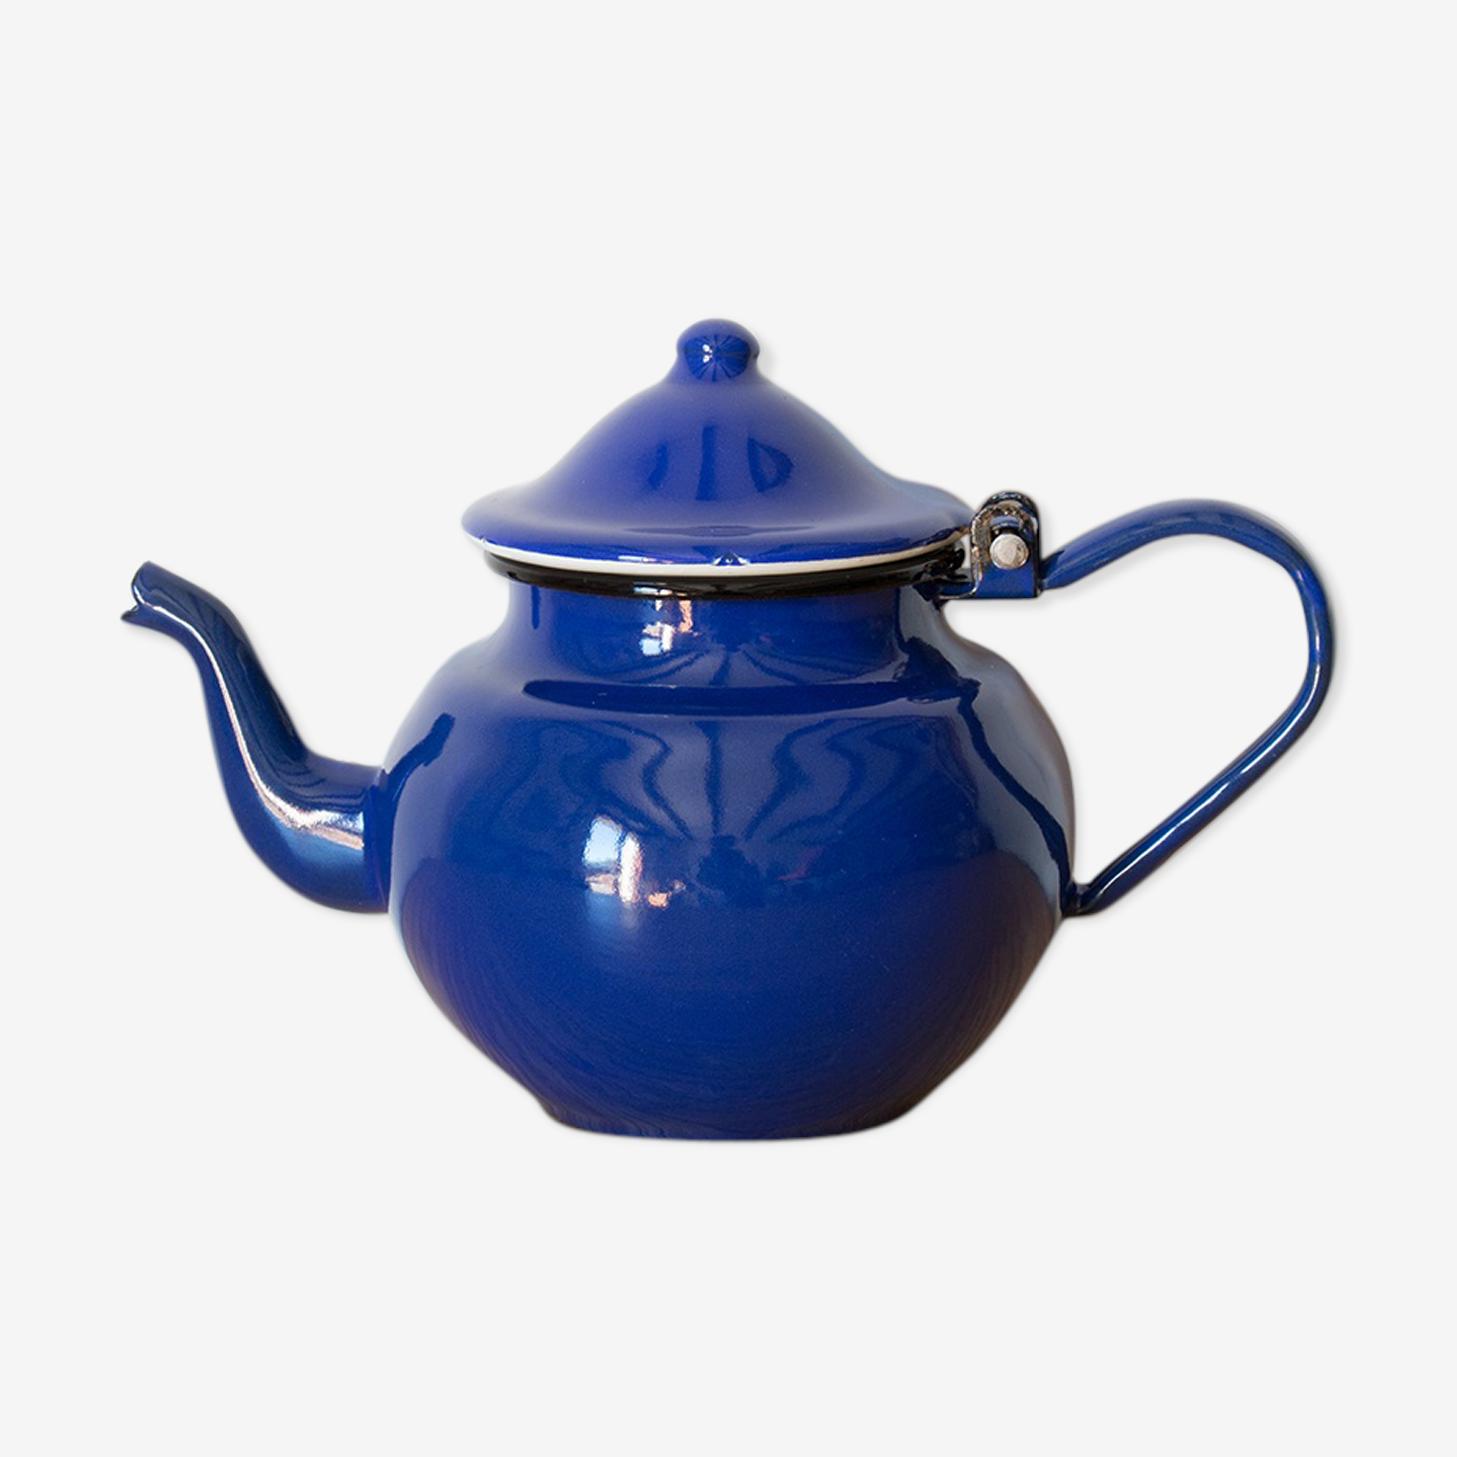 Glazed teapot